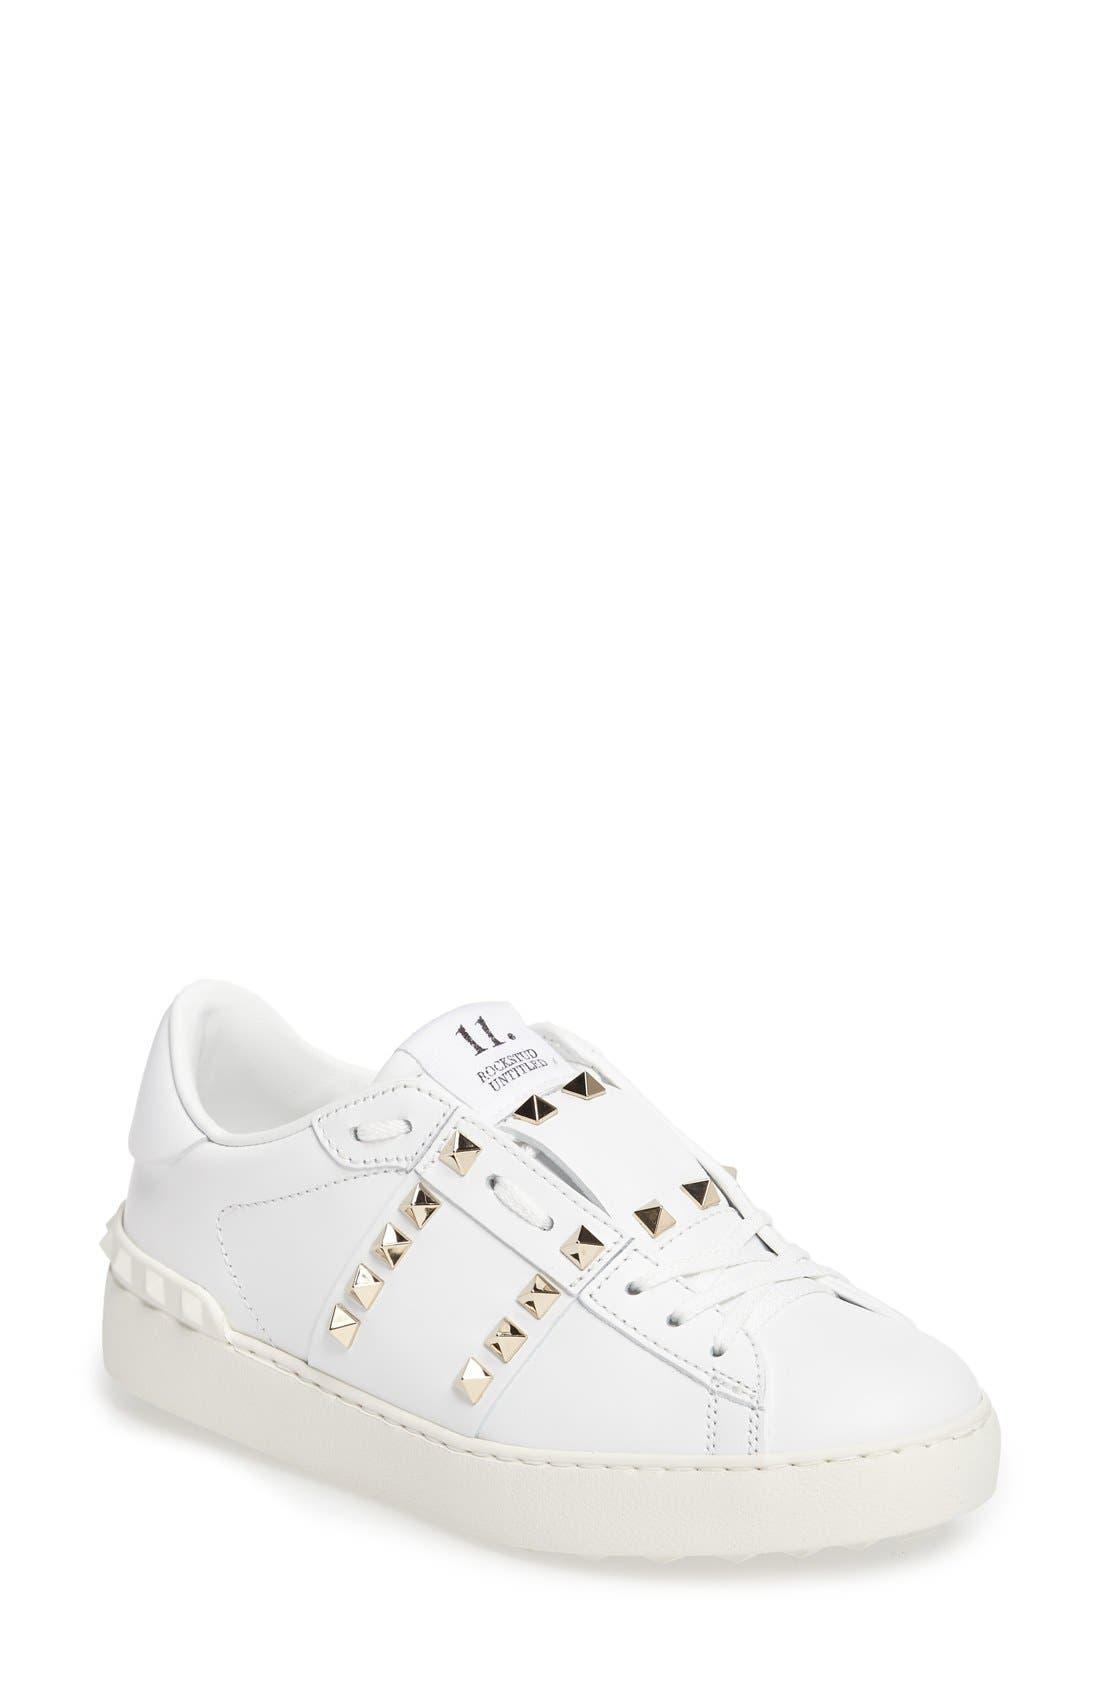 VALENTINO GARAVANI 'Rockstud' Sneaker (Women)